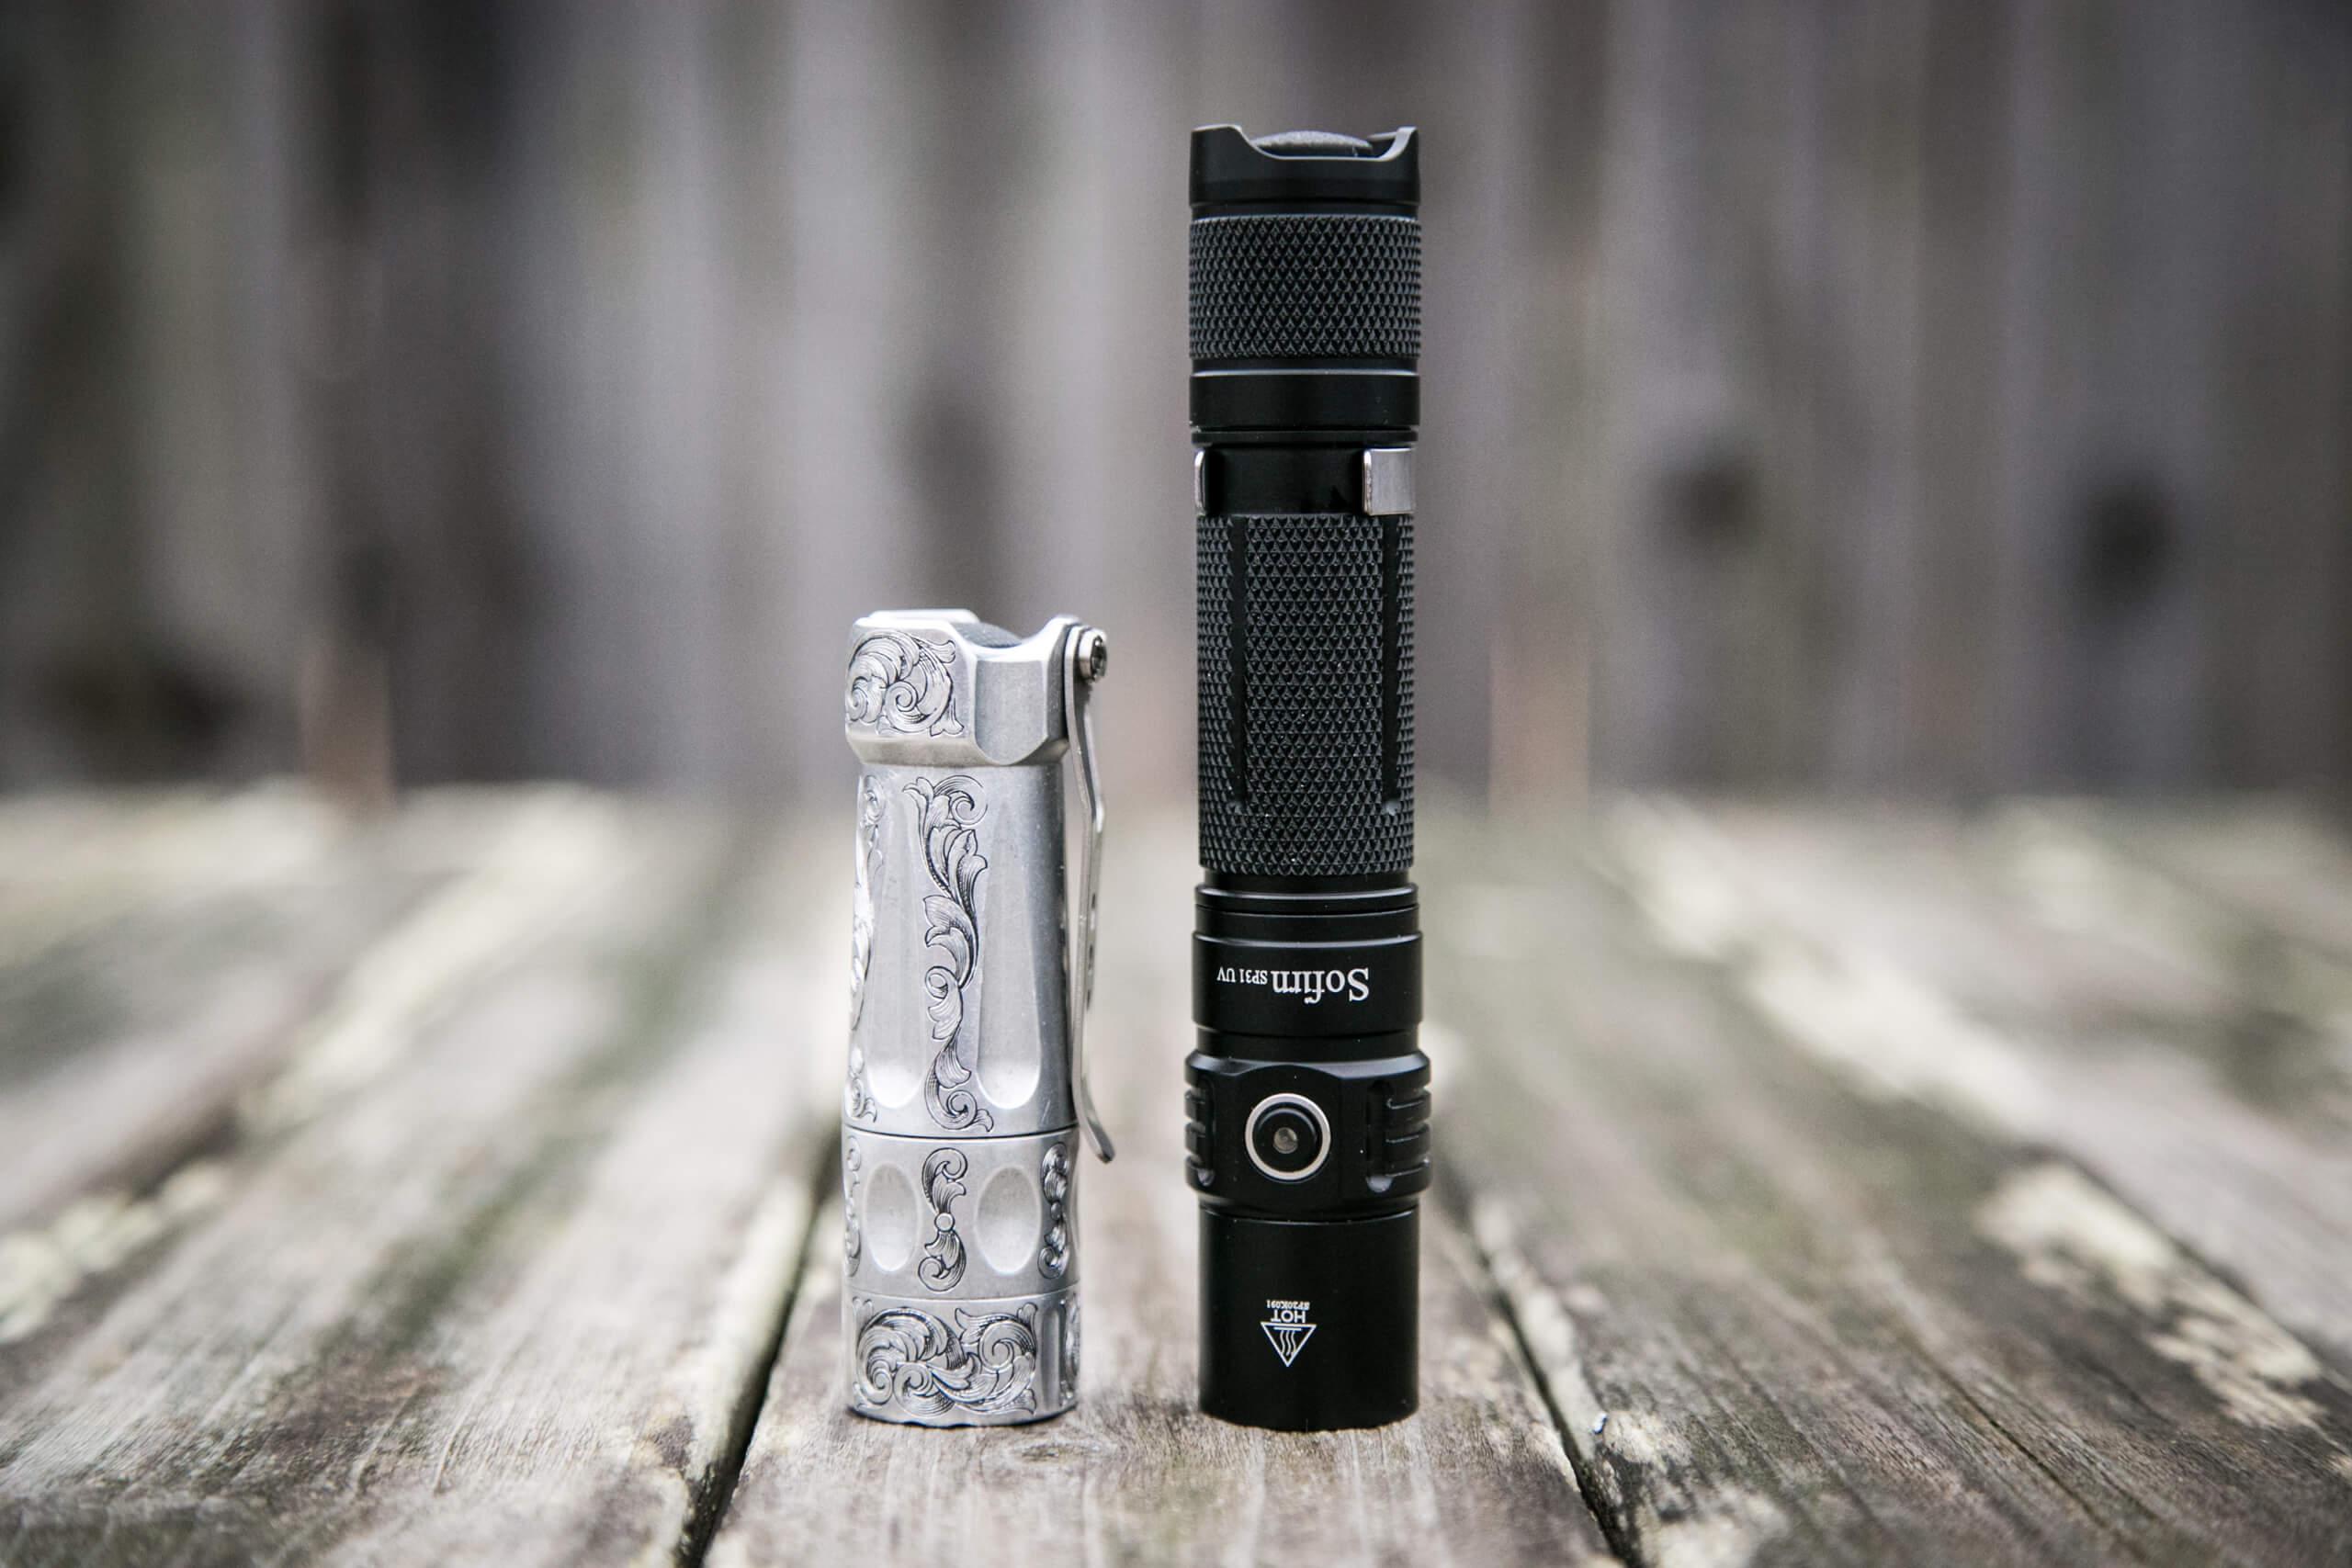 sofirn sp31uv ultraviolet 18650 flashlight beside torchlab boss 35